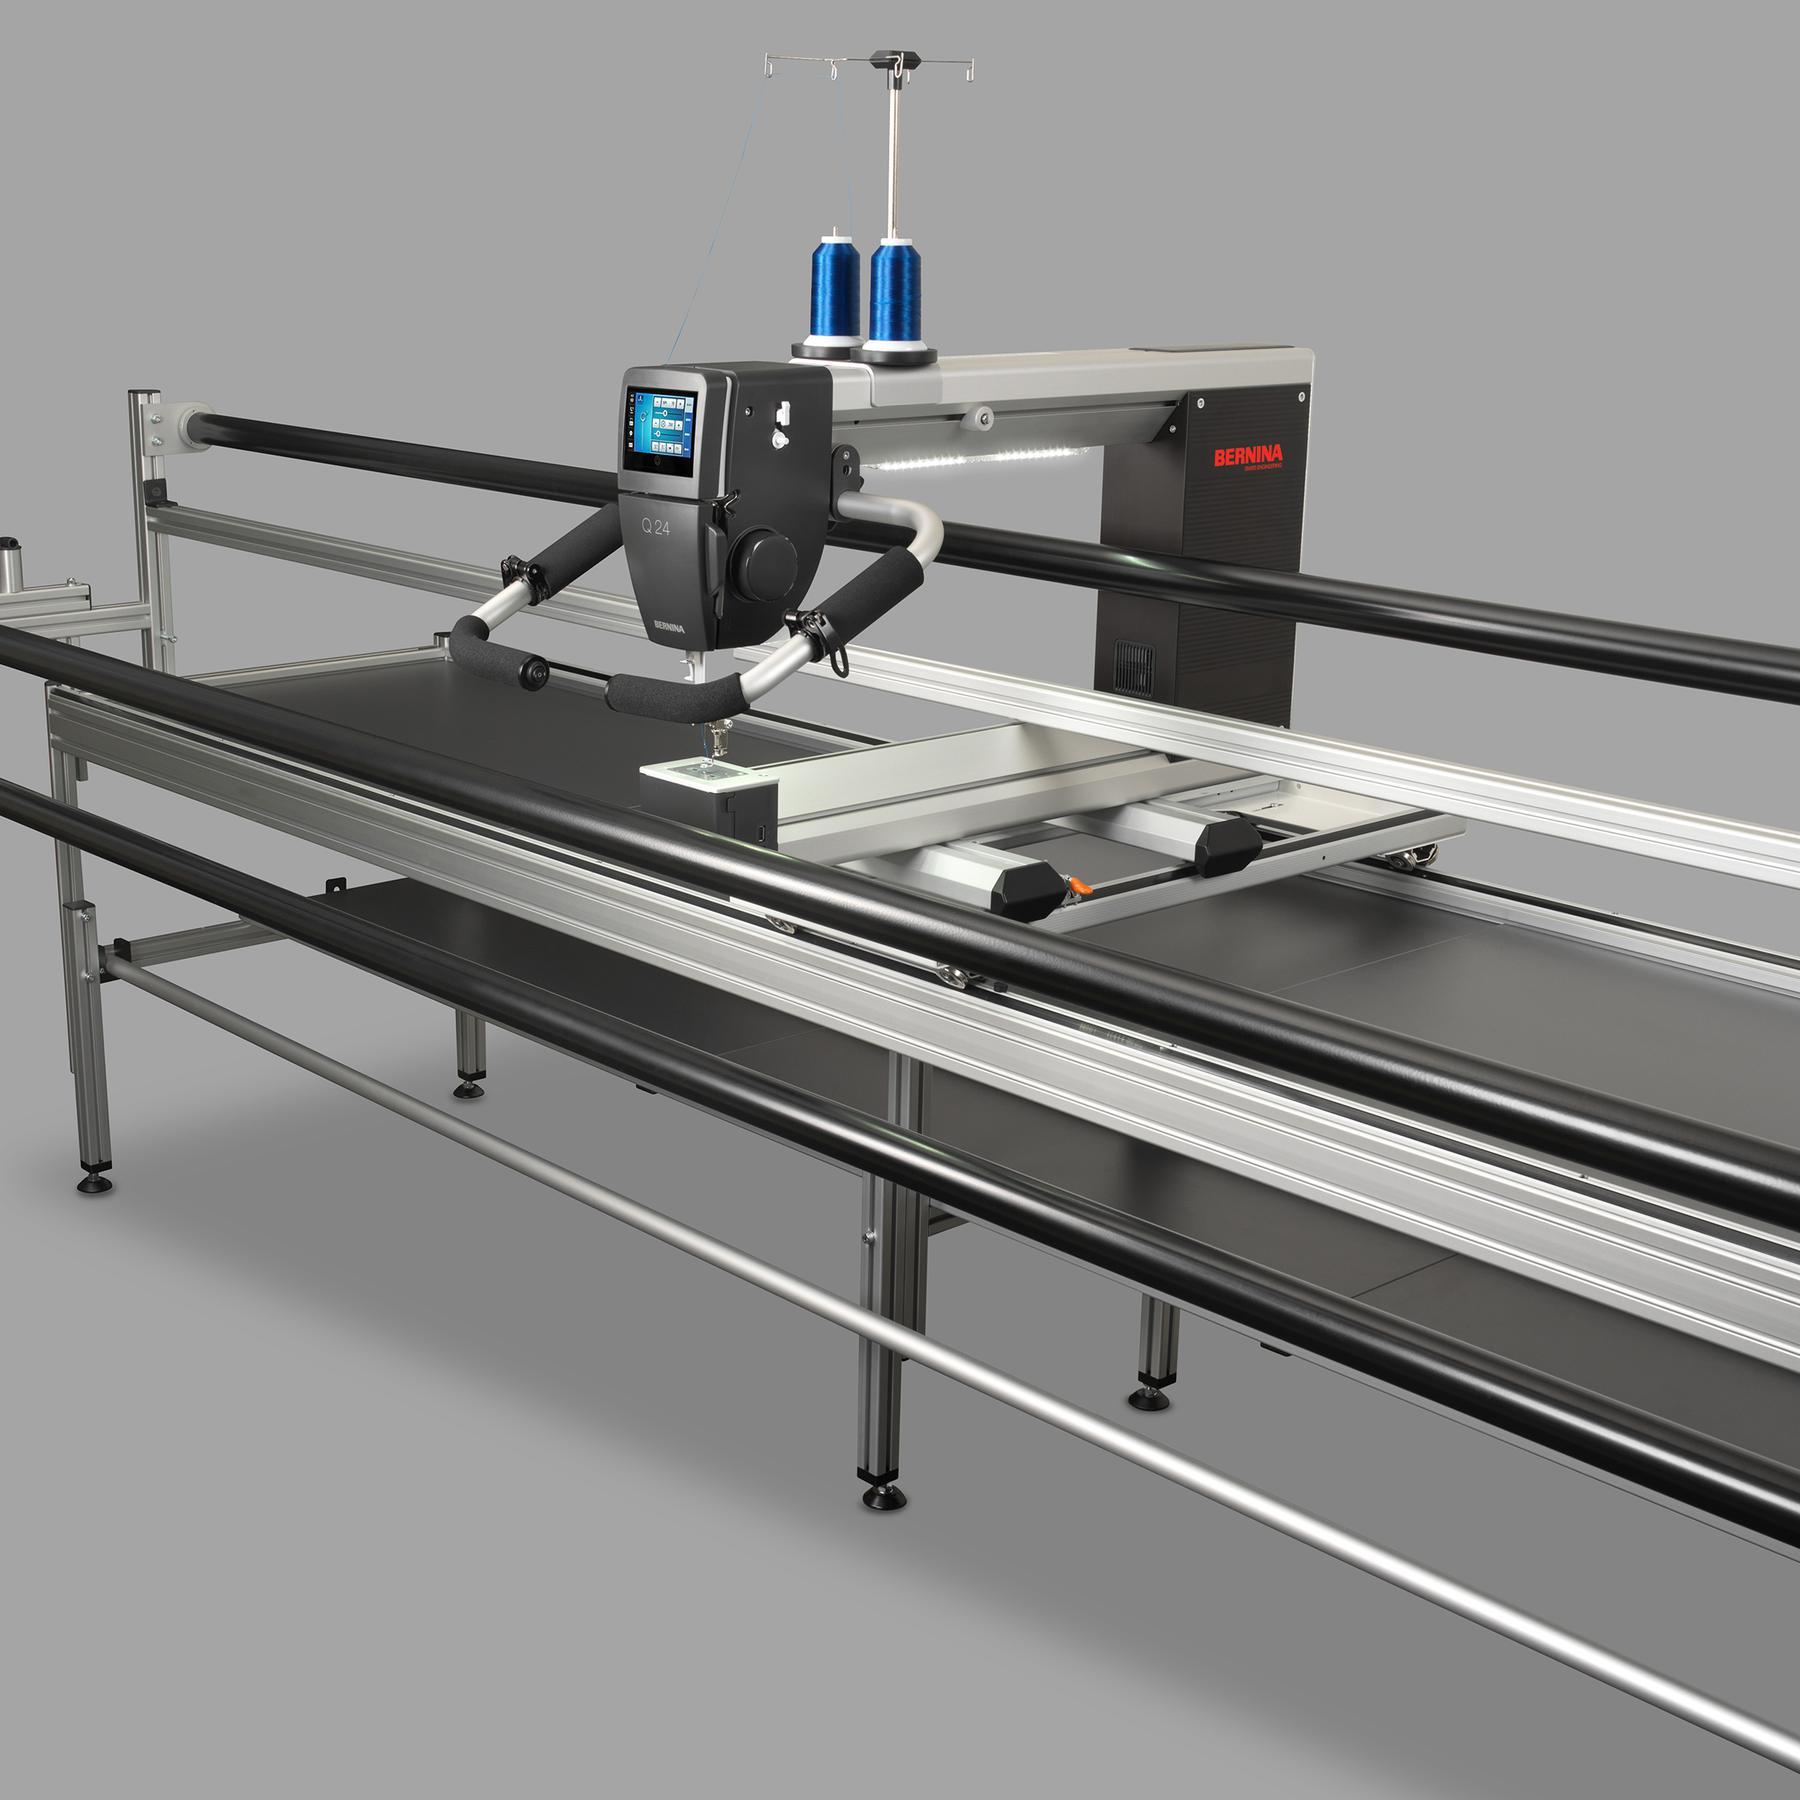 Bernina Q24 Frank Nutt Sewing Machines Ltd Buy Online